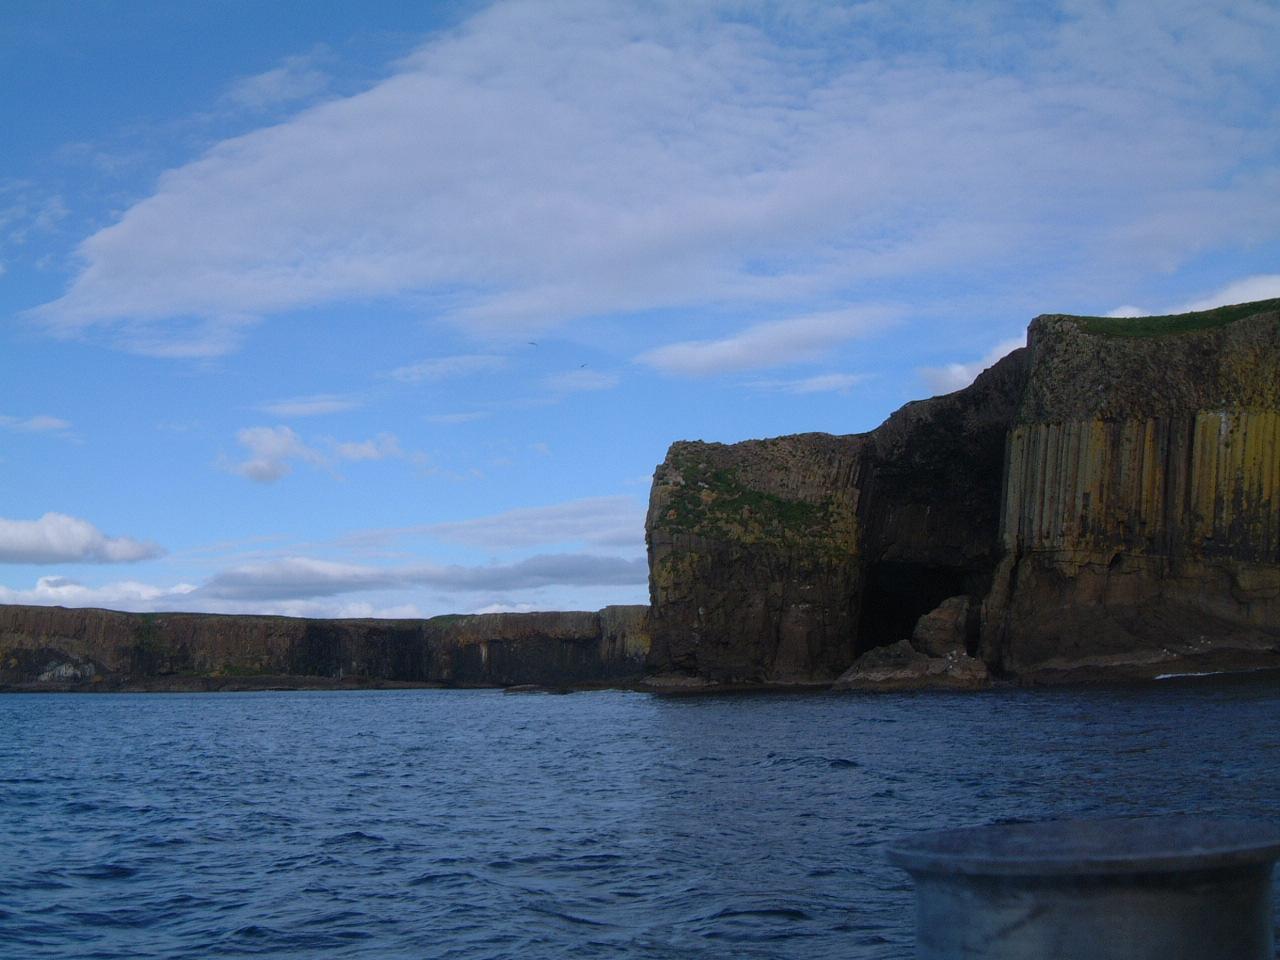 Staffa from the Sea